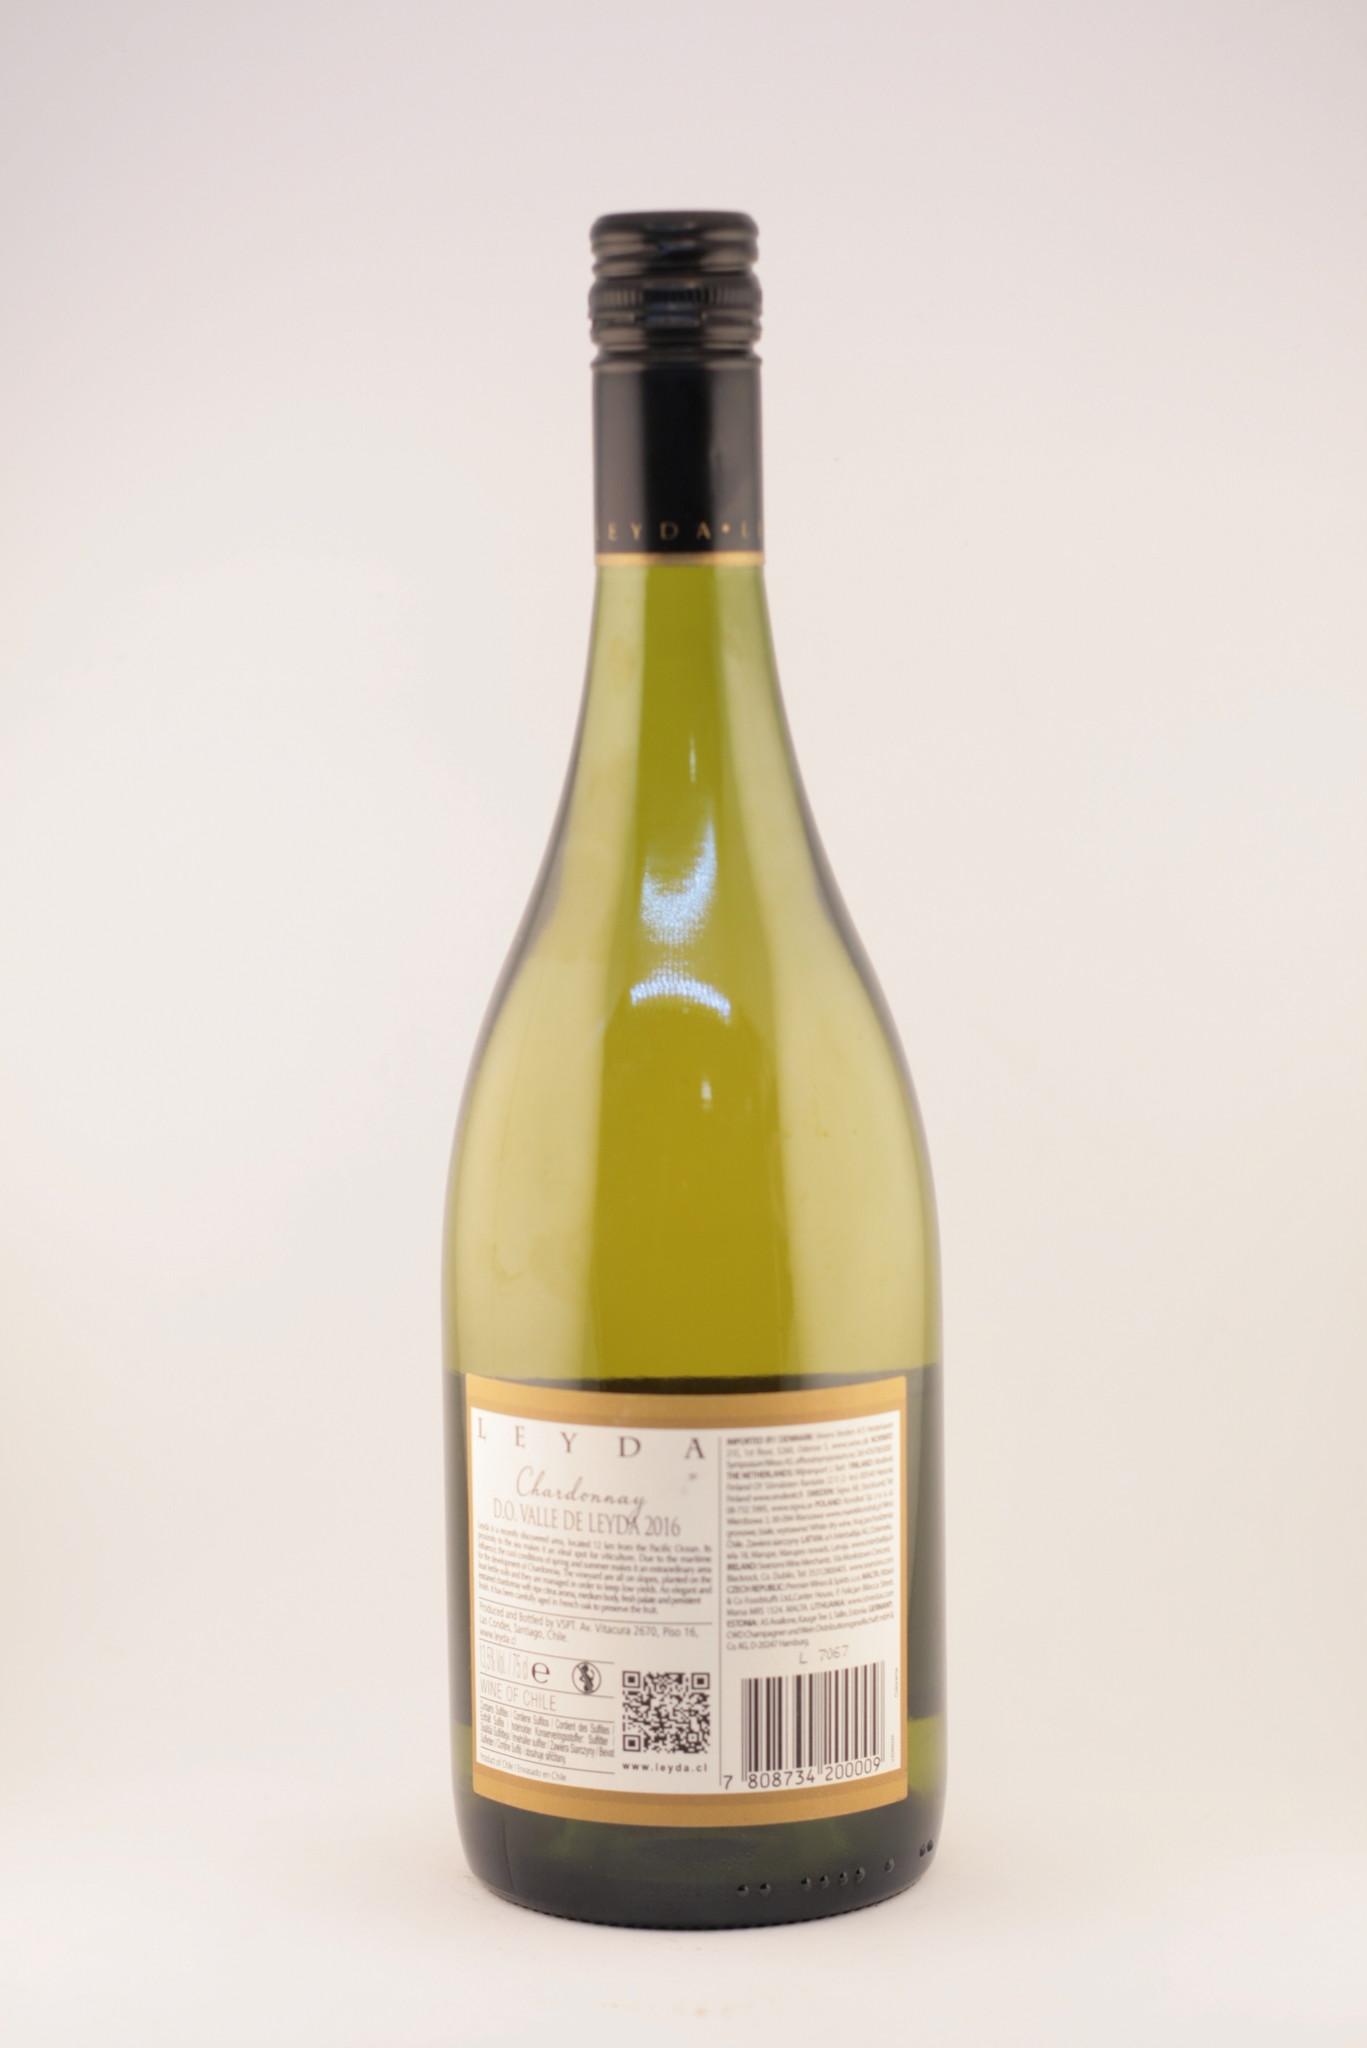 Falaris hill | Single vineyard | Vina Leyda | 2017 | Leyda Vallei | Chardonnay